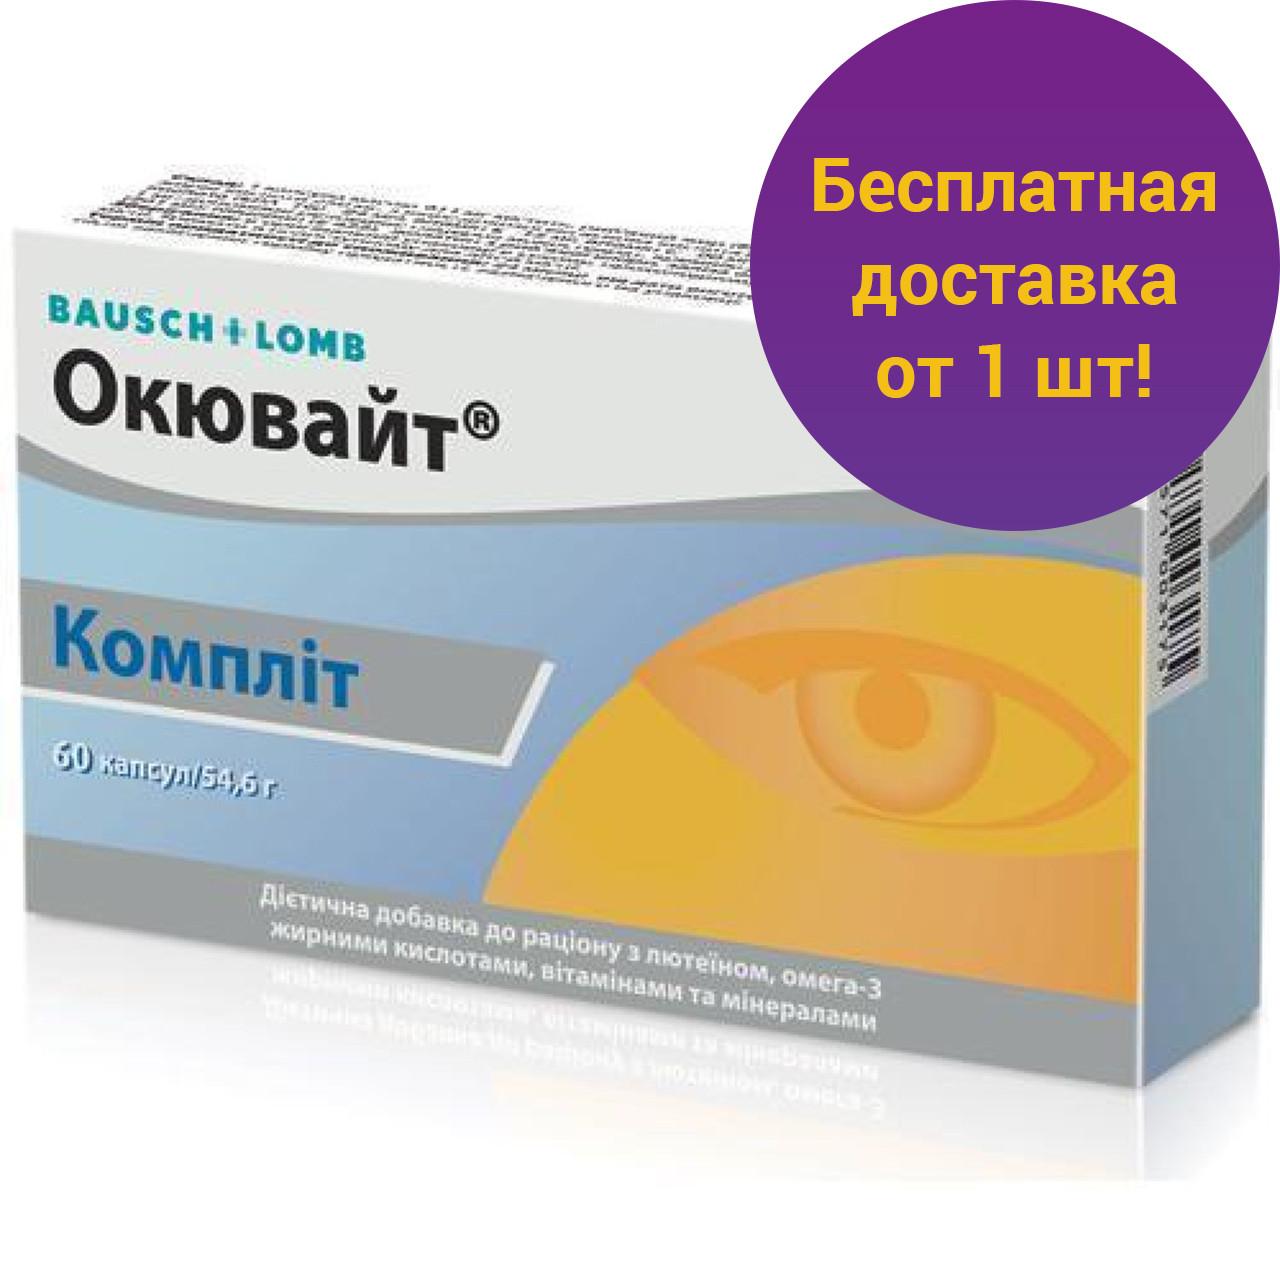 Окувайт Комплит Bauch+Lomb (витамины для глаз). 60 капсул